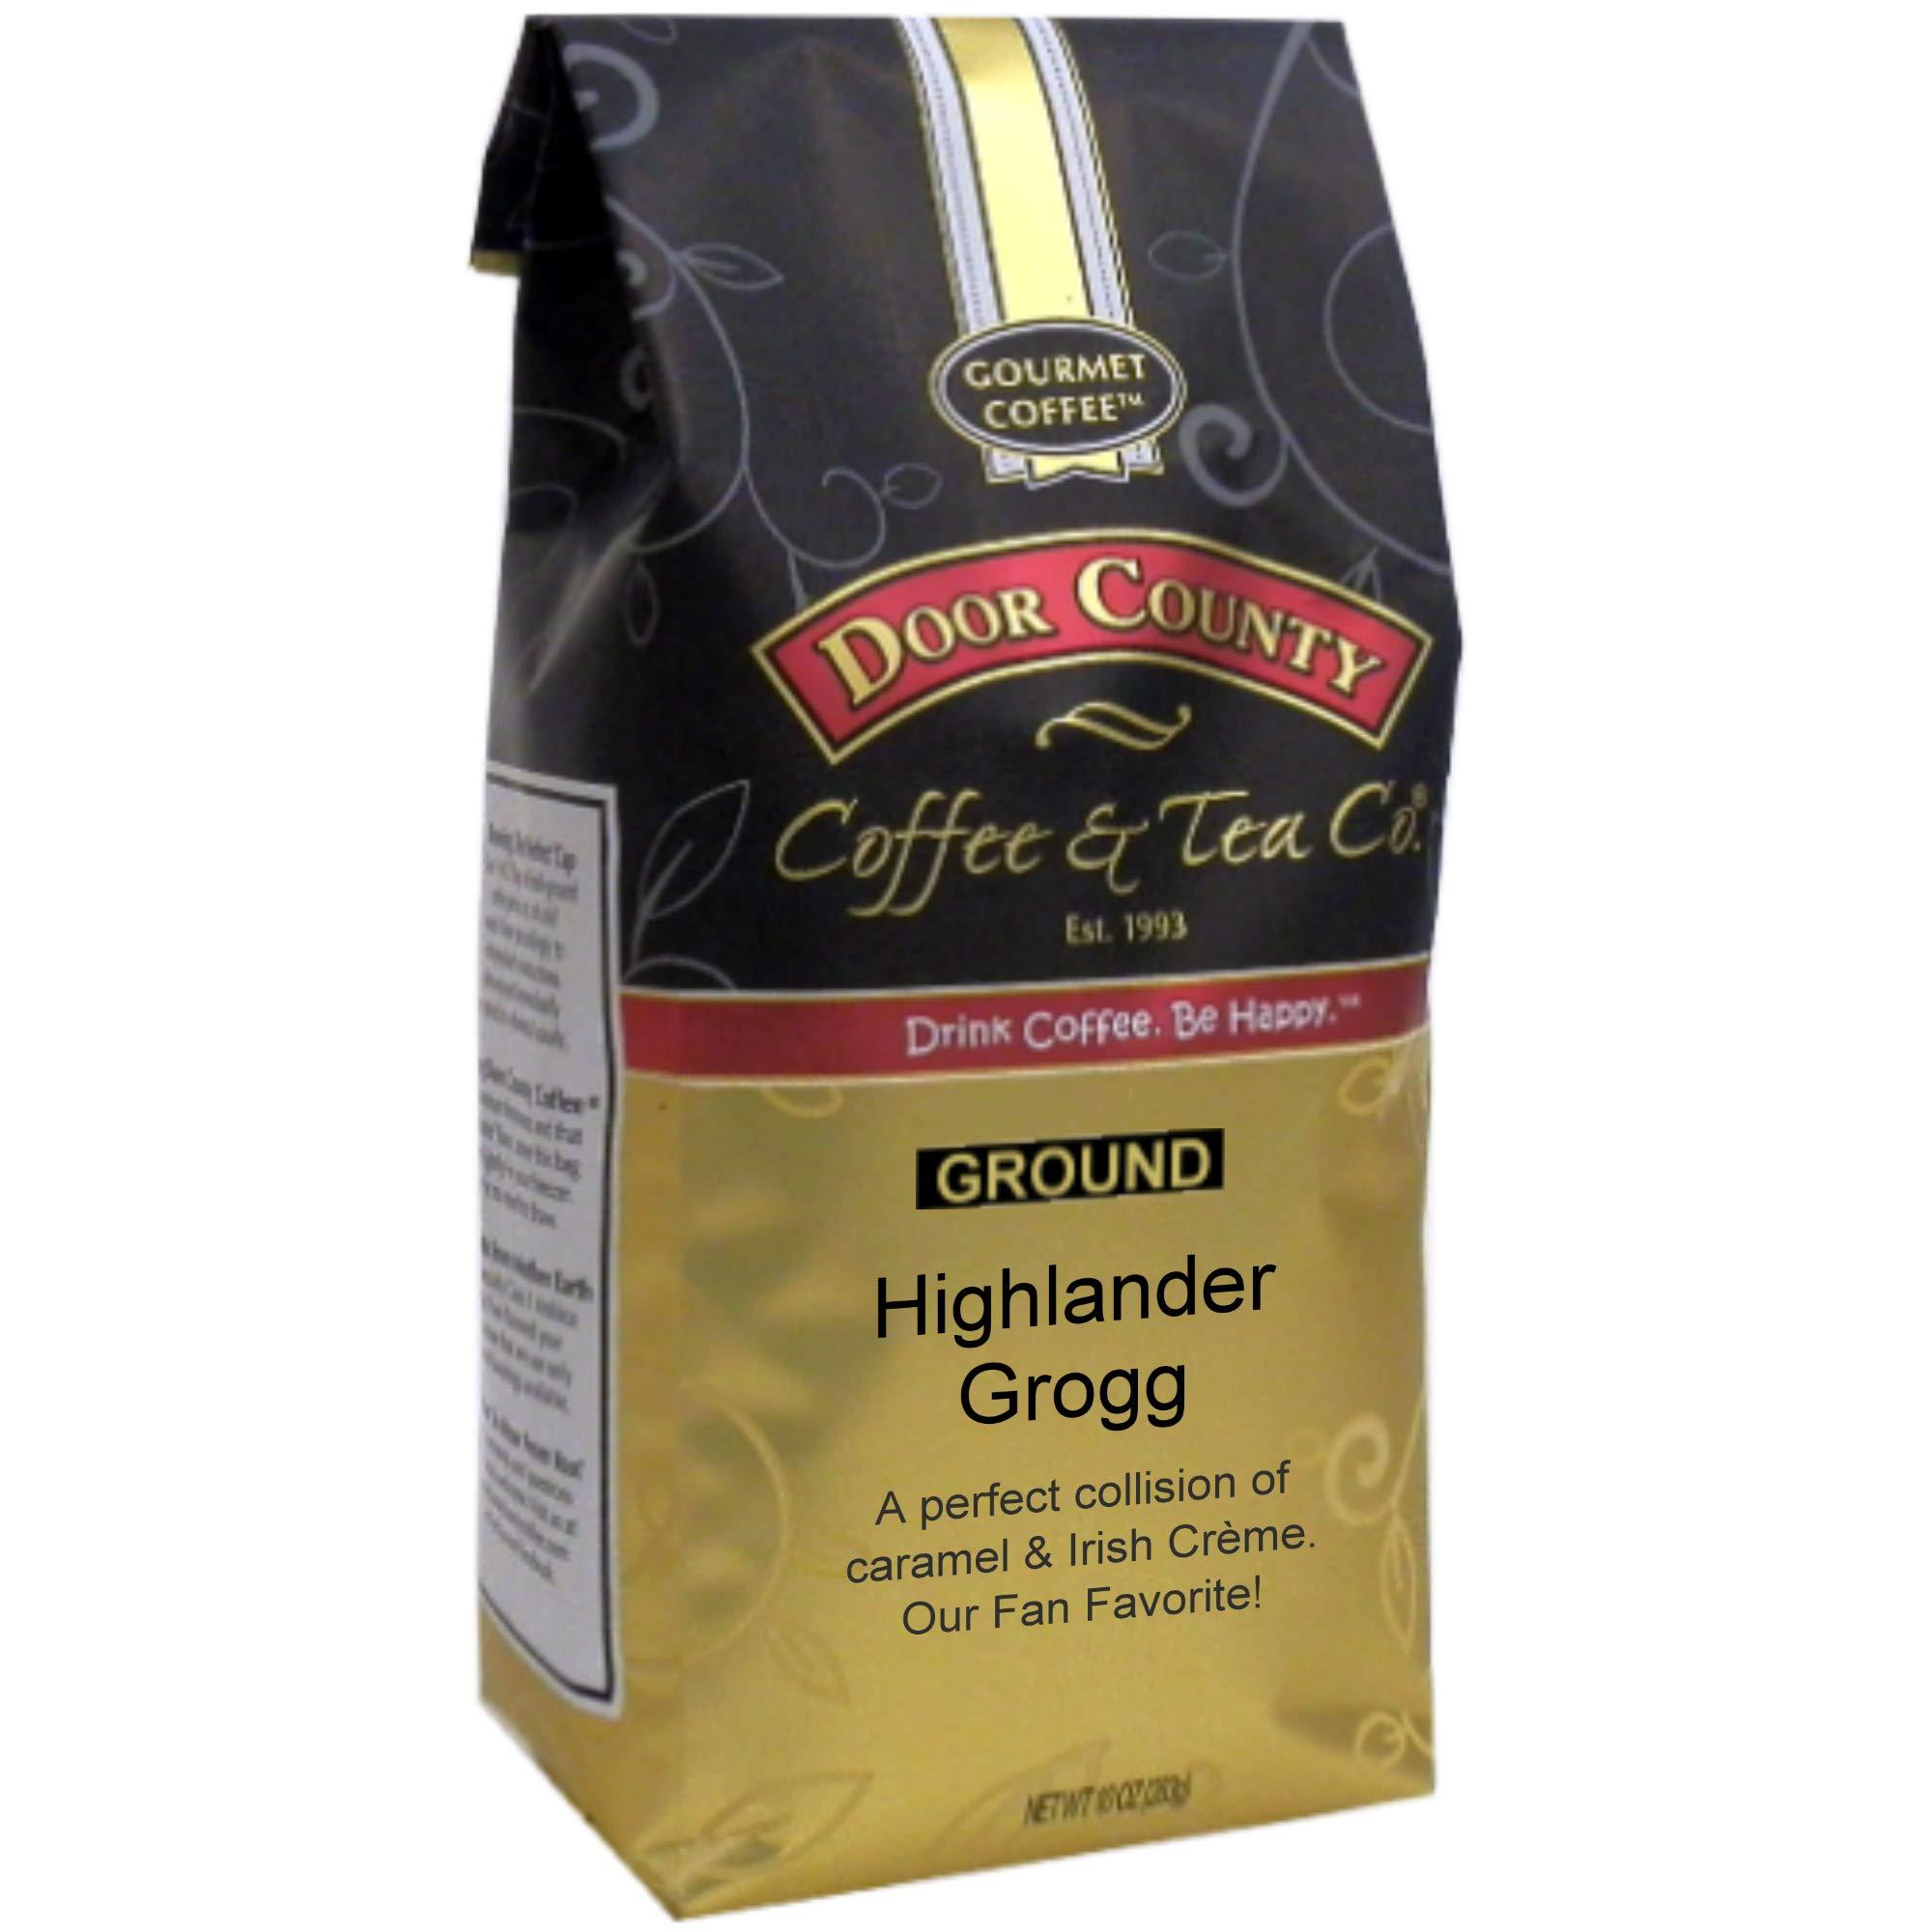 Door County Coffee, Highlander Grogg, Irish Creme and Caramel Flavored Coffee, Medium Roast, Ground Coffee, 10 oz Bag